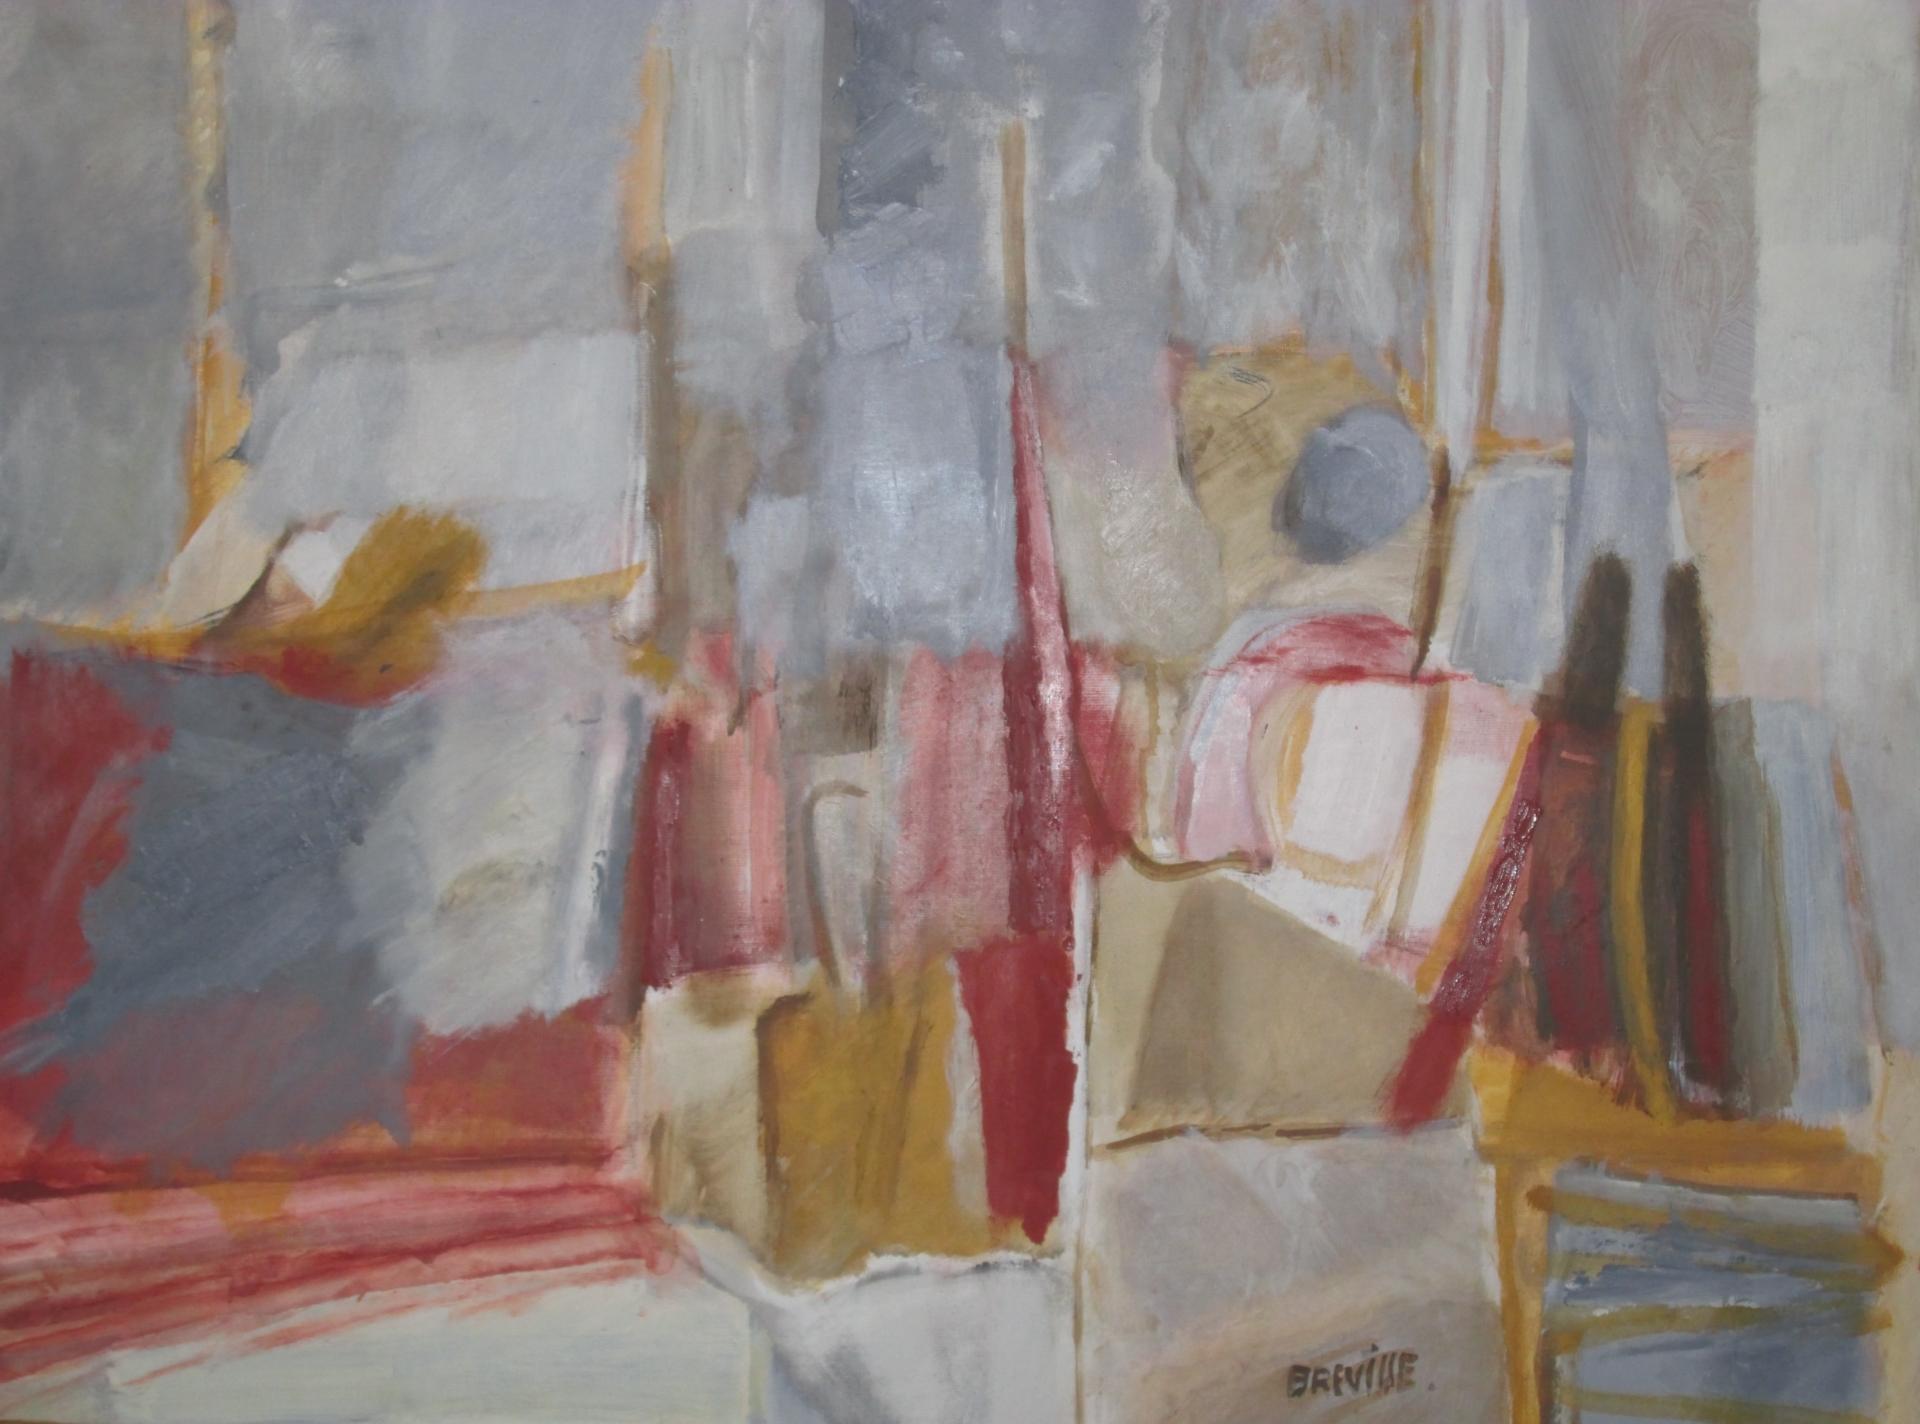 expo Compositions , Arlette de Breville .Mna_1058